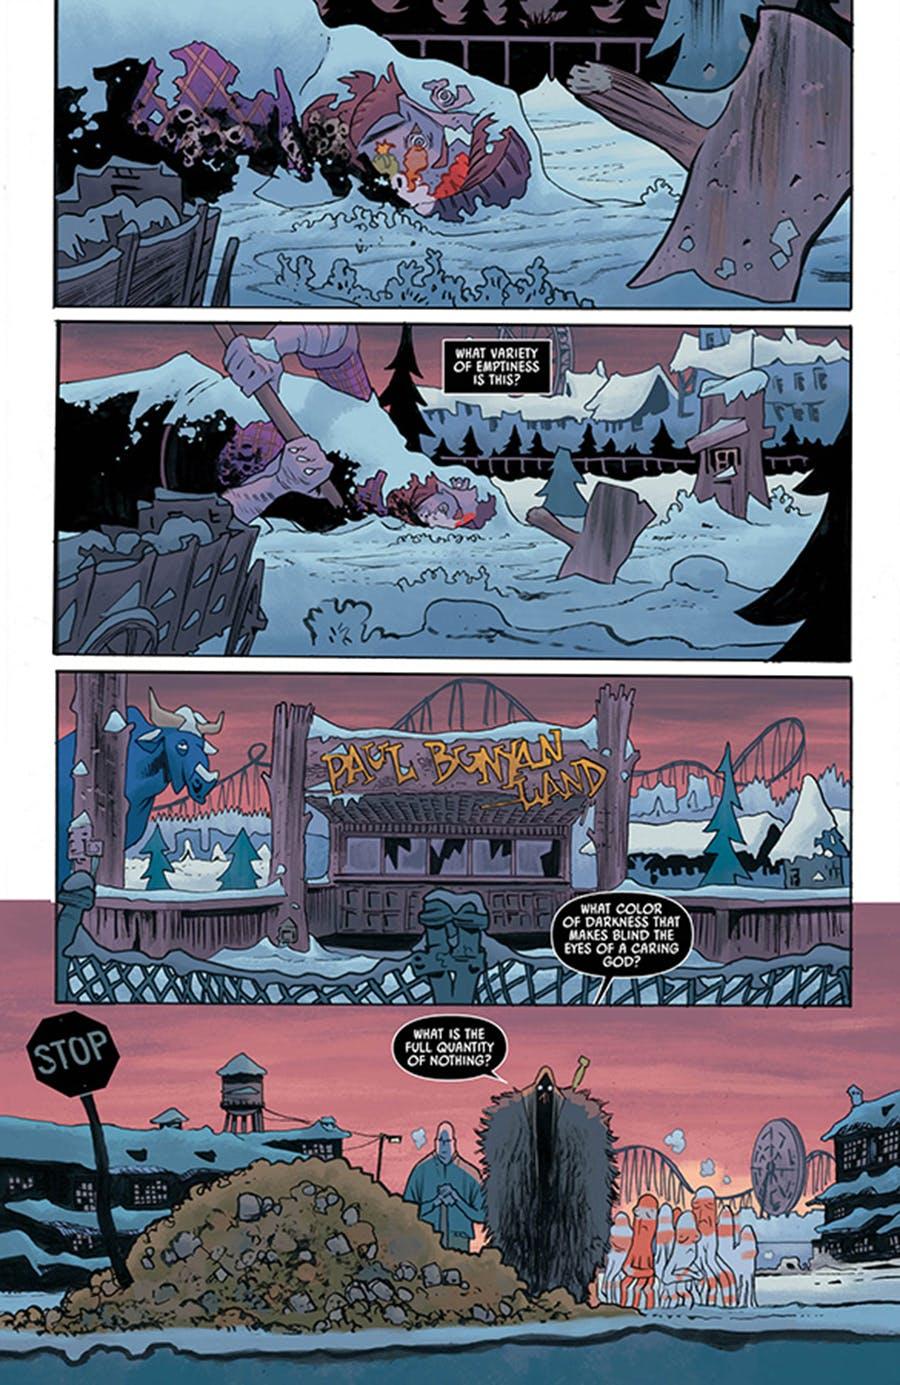 Rumble #11, anteprima 01